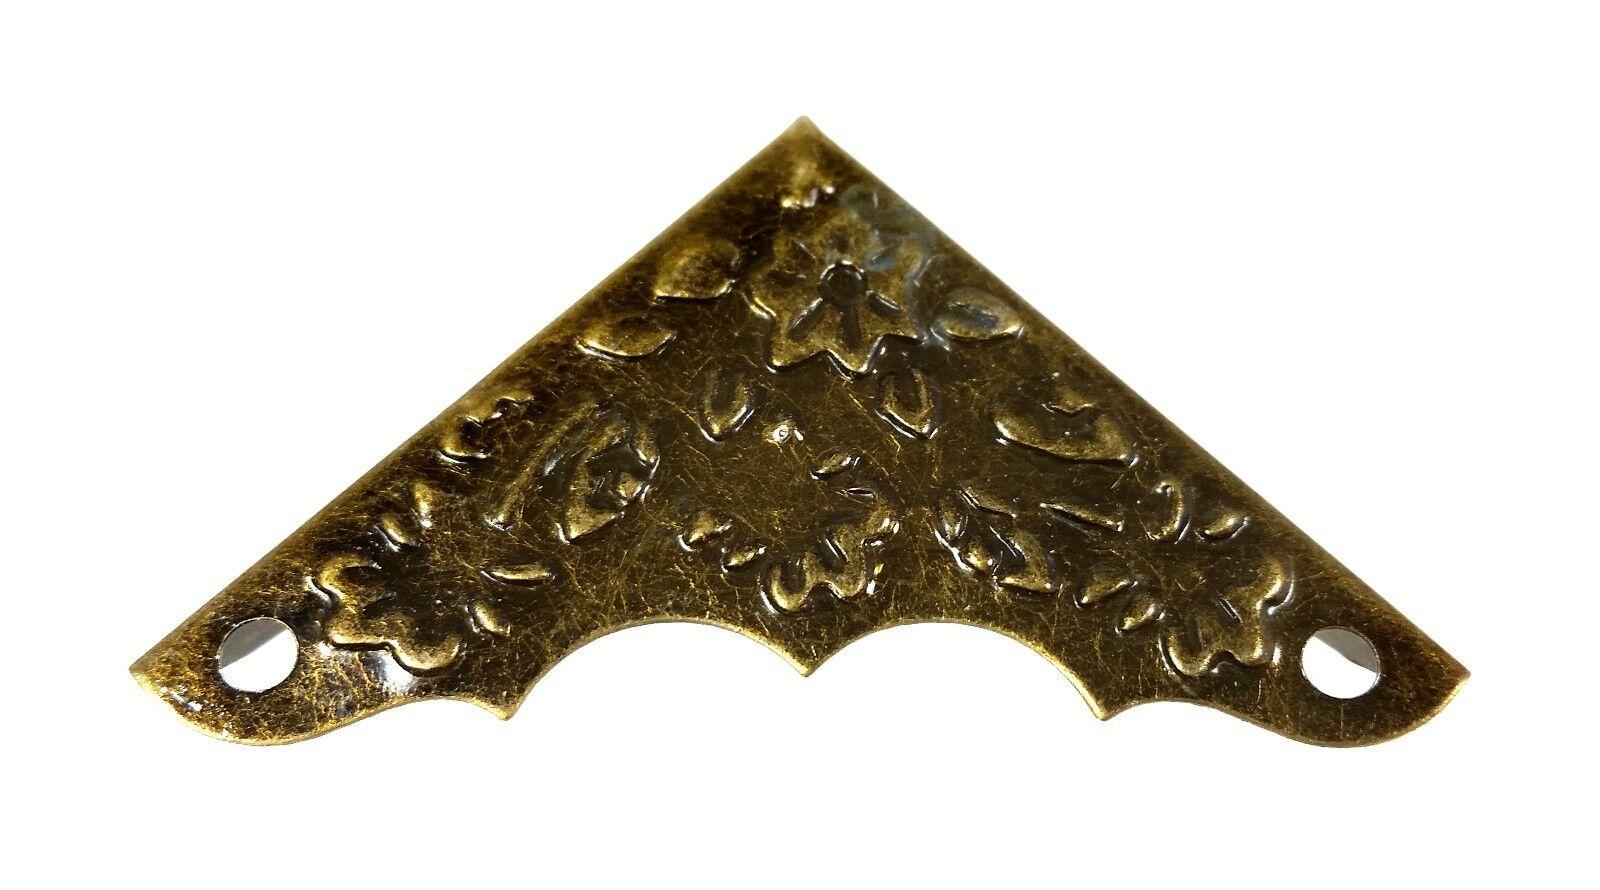 Decorative Box Corner Brass Plated : Pc antique brass plated box corners with decorative